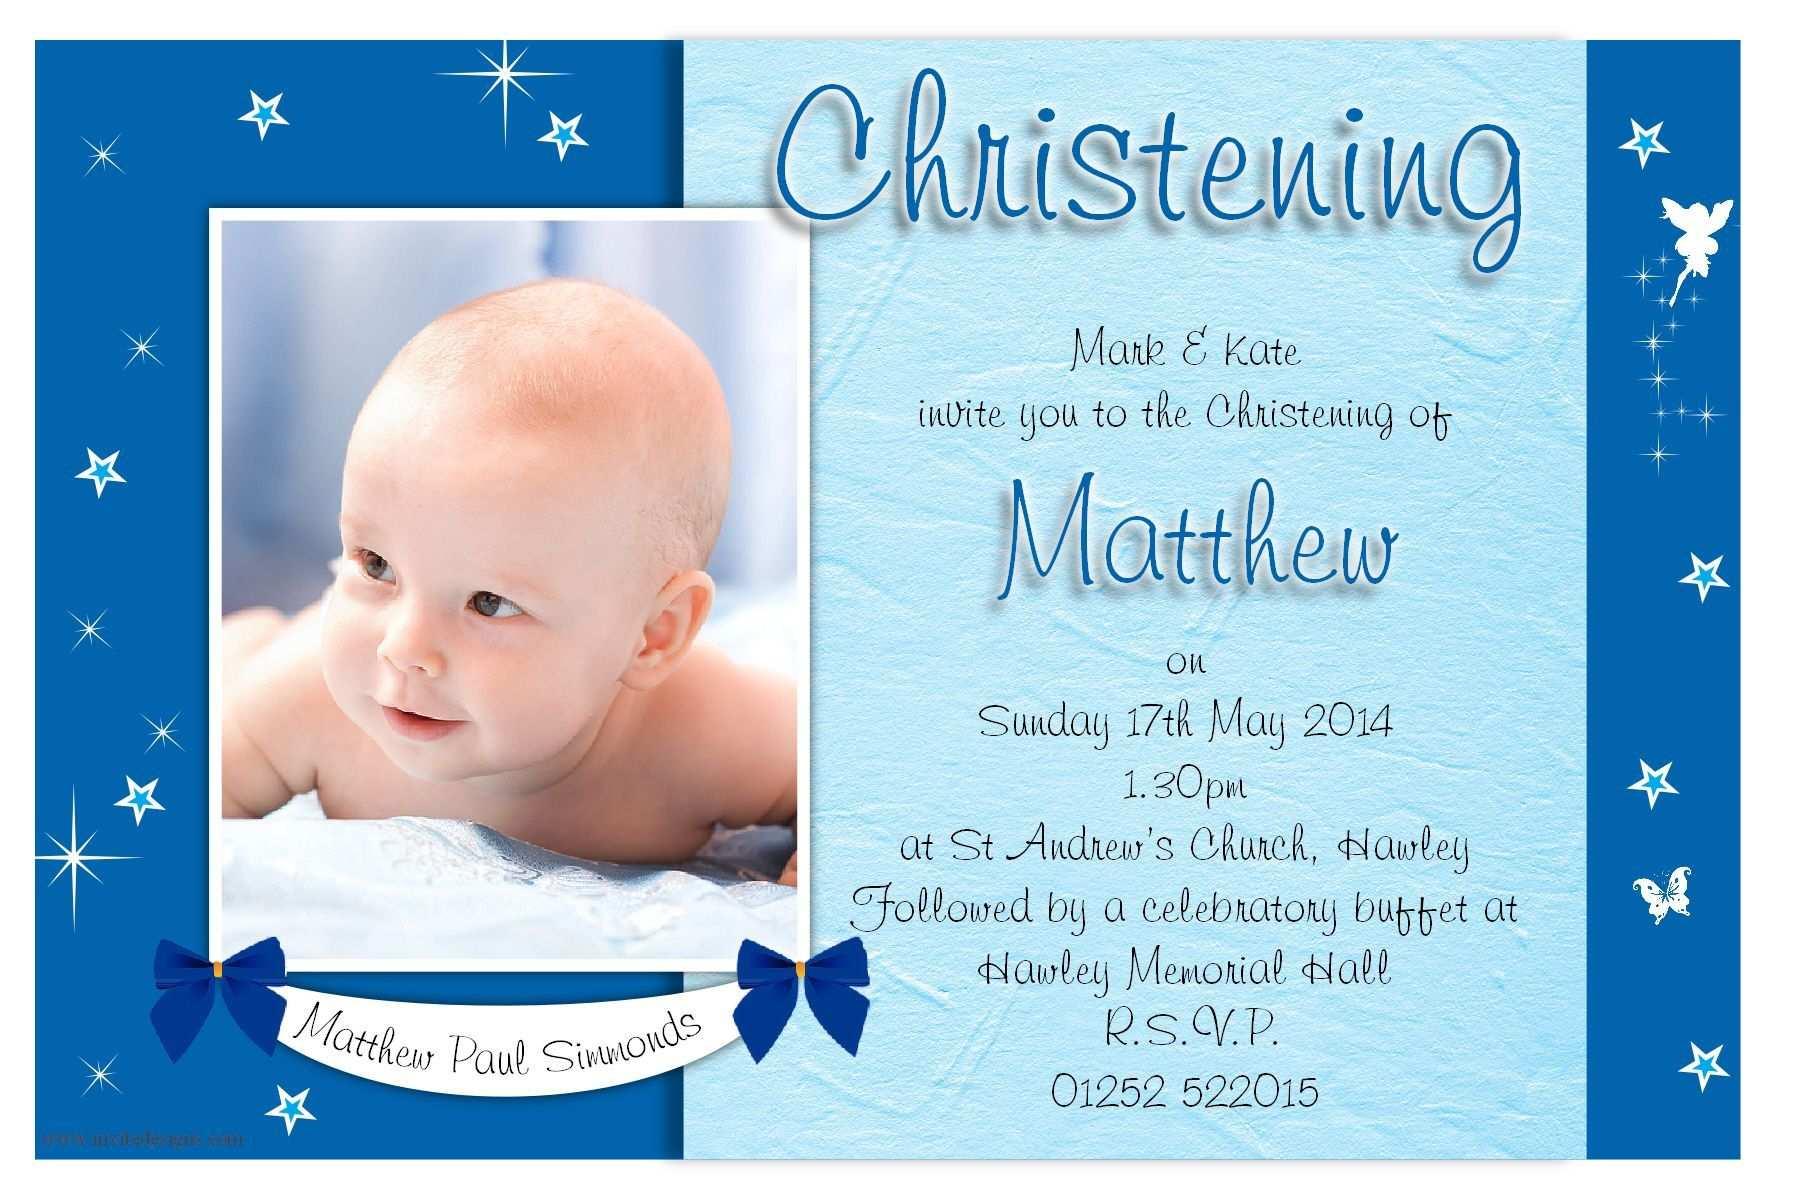 Thank You Card Template Baptism - Cards Design Templates